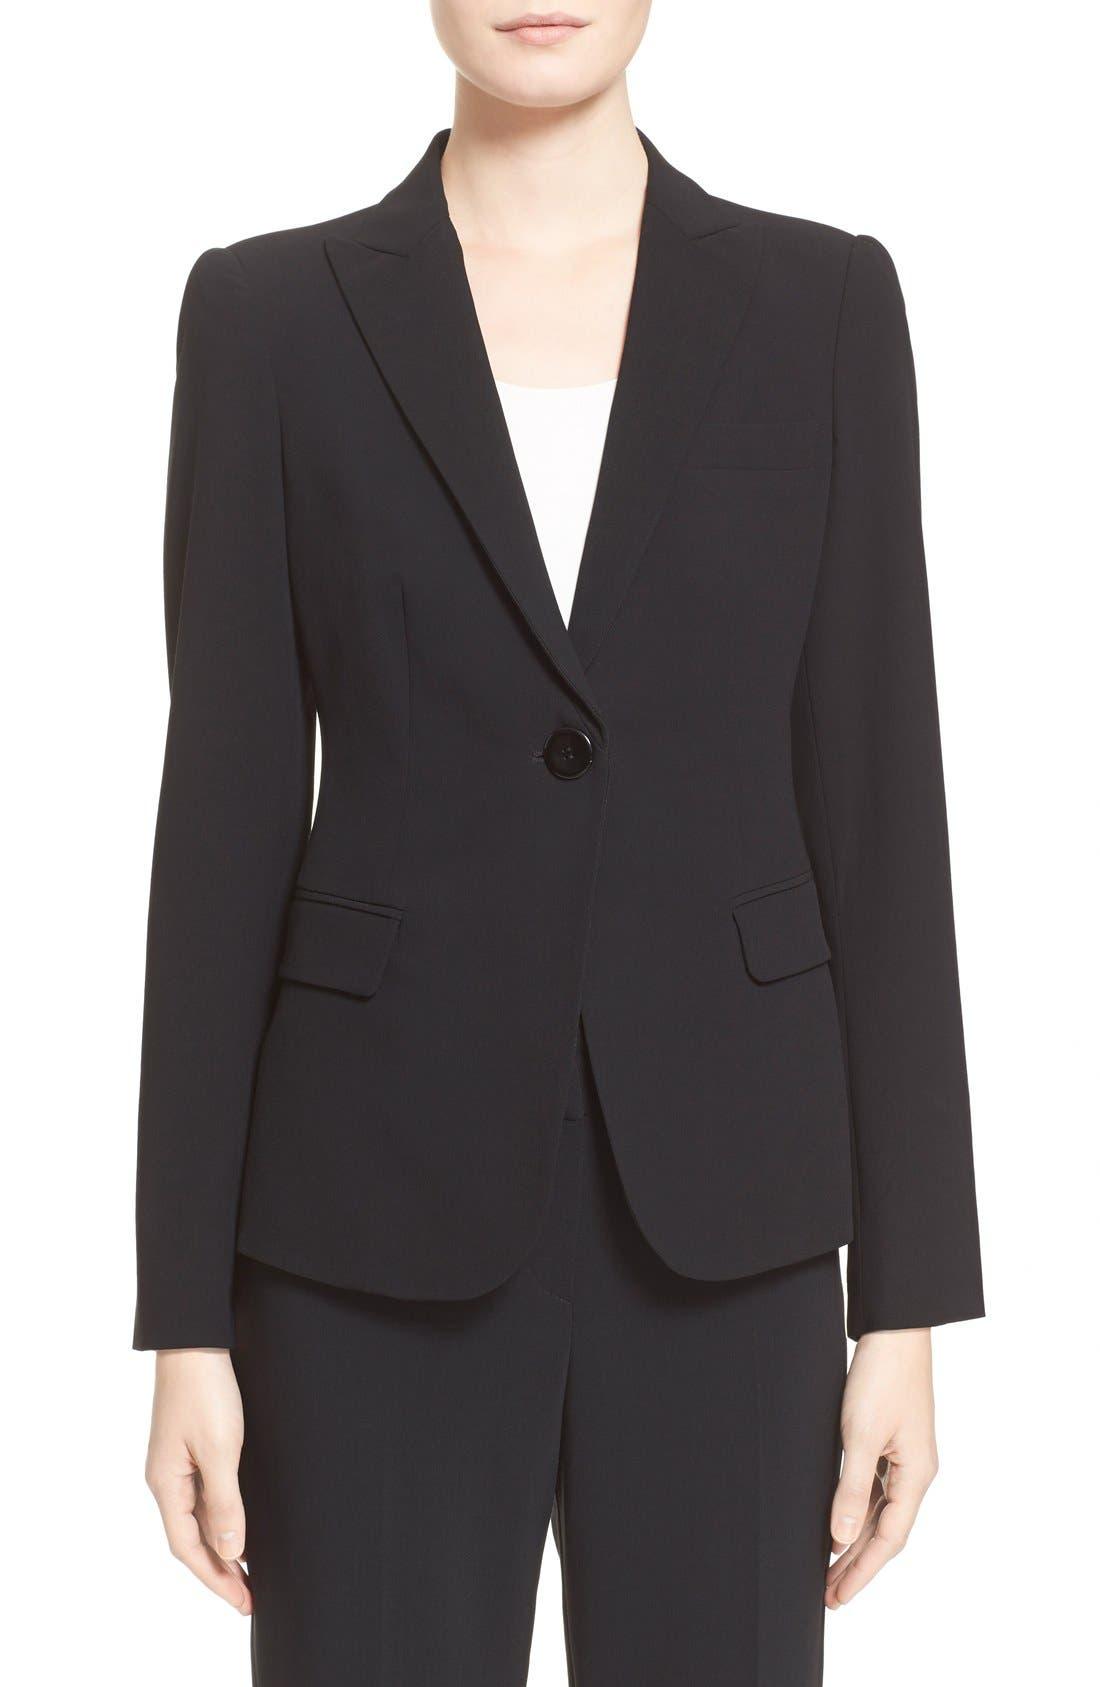 Alternate Image 1 Selected - Armani Collezioni Single Button Wool Jacket